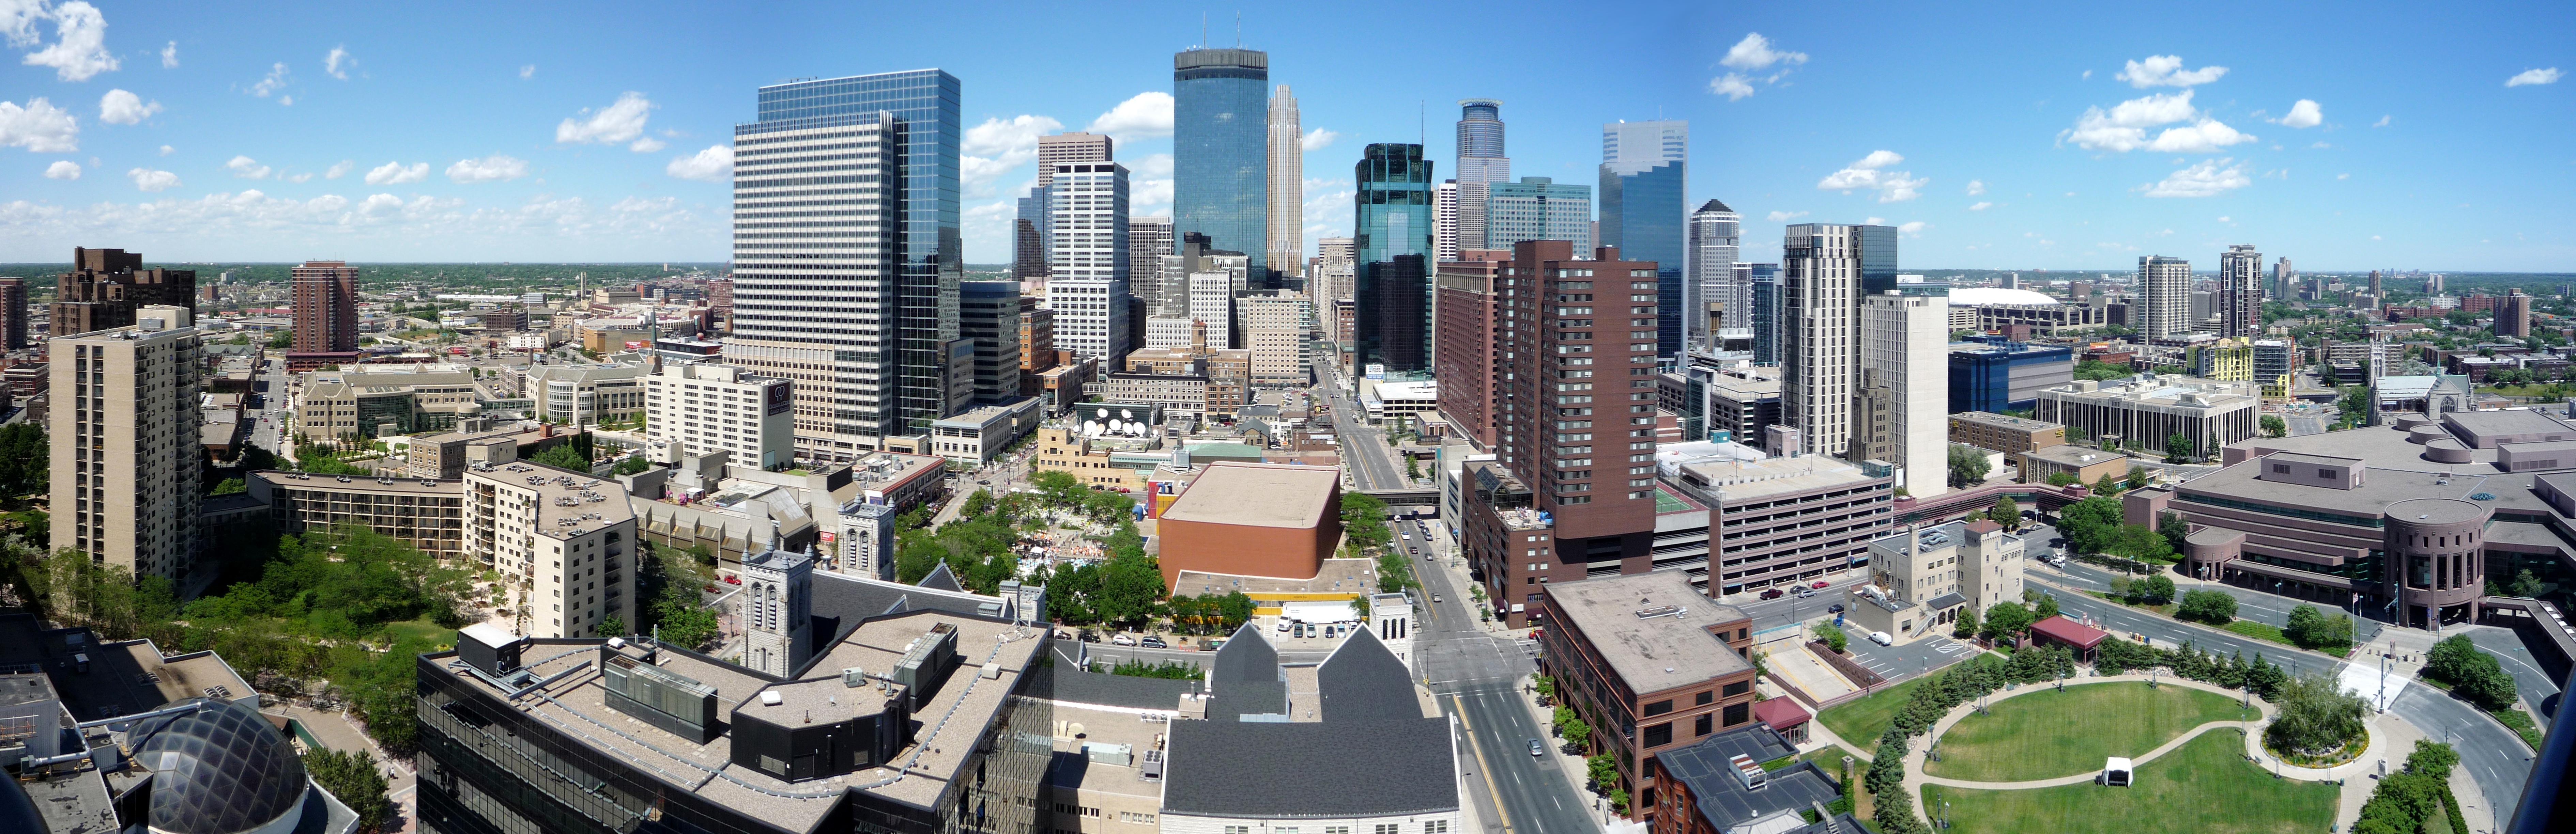 List Of Tallest Buildings In Minneapolis